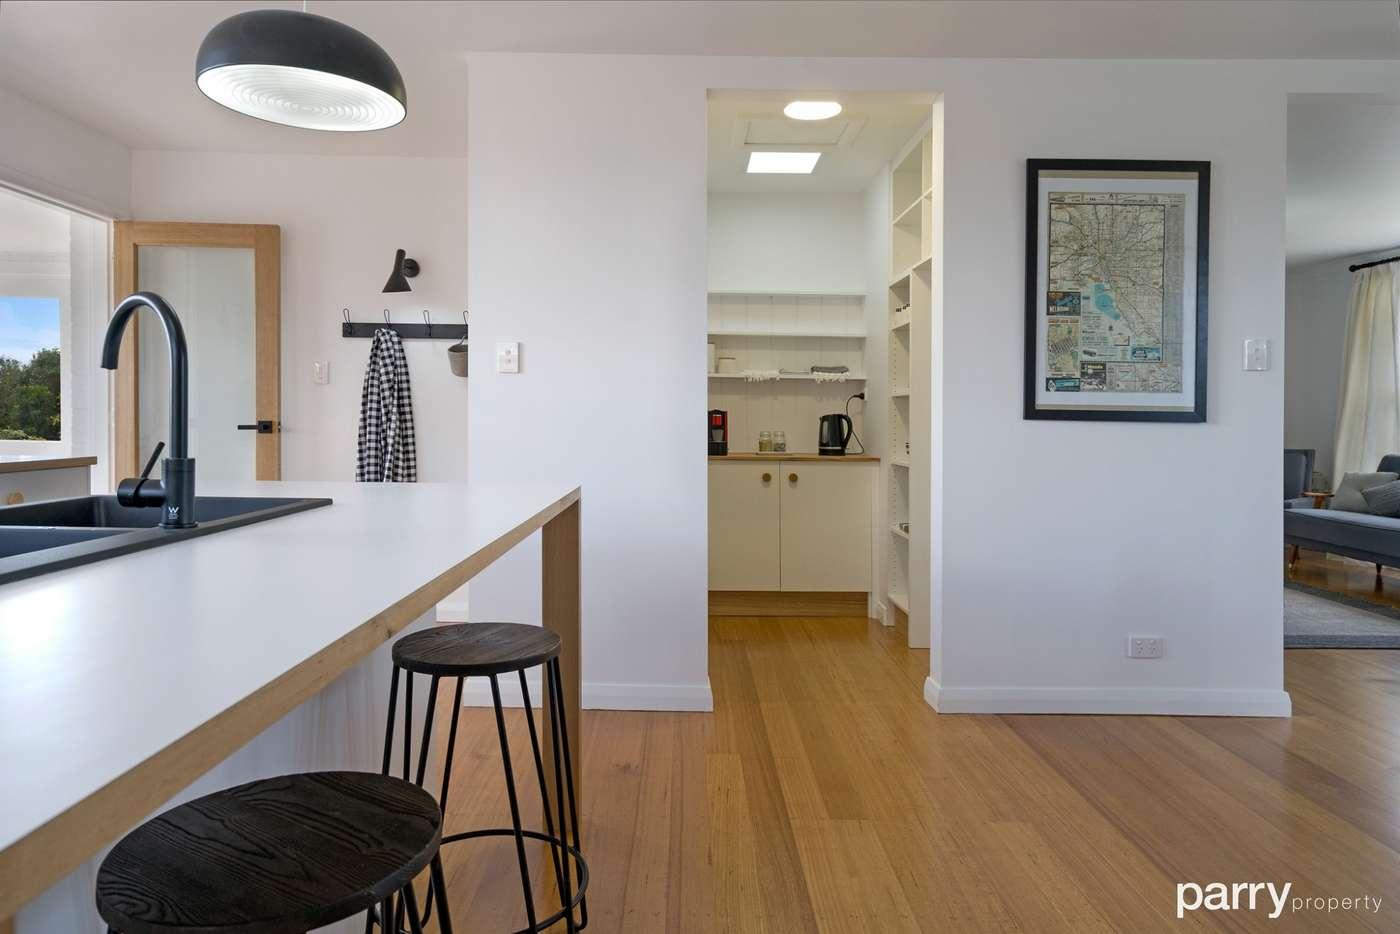 Sixth view of Homely house listing, 153 Cambridge Street, West Launceston TAS 7250